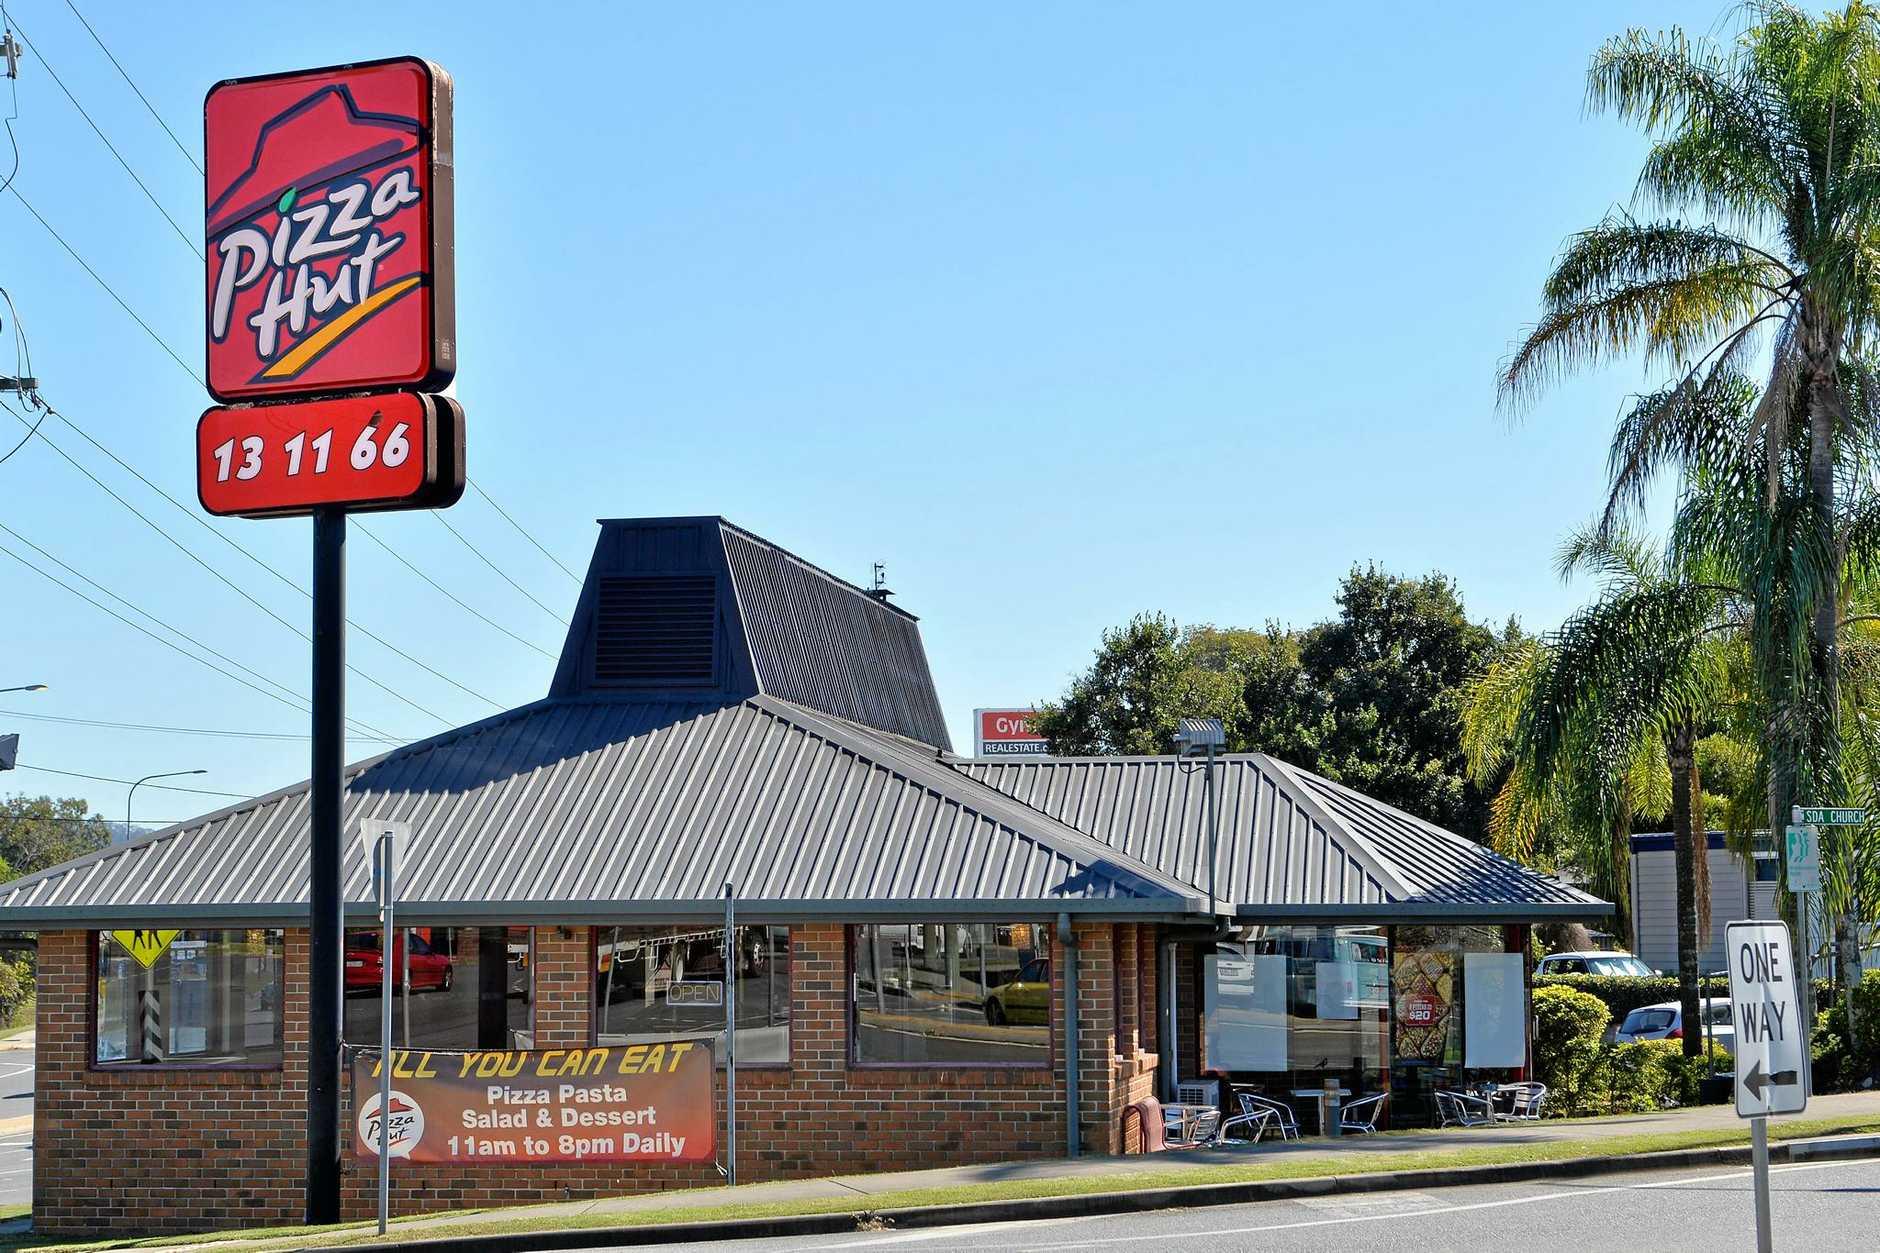 Pizza Hut Restaraunt, Brisbane Road, Gympie. May 30, 2016.